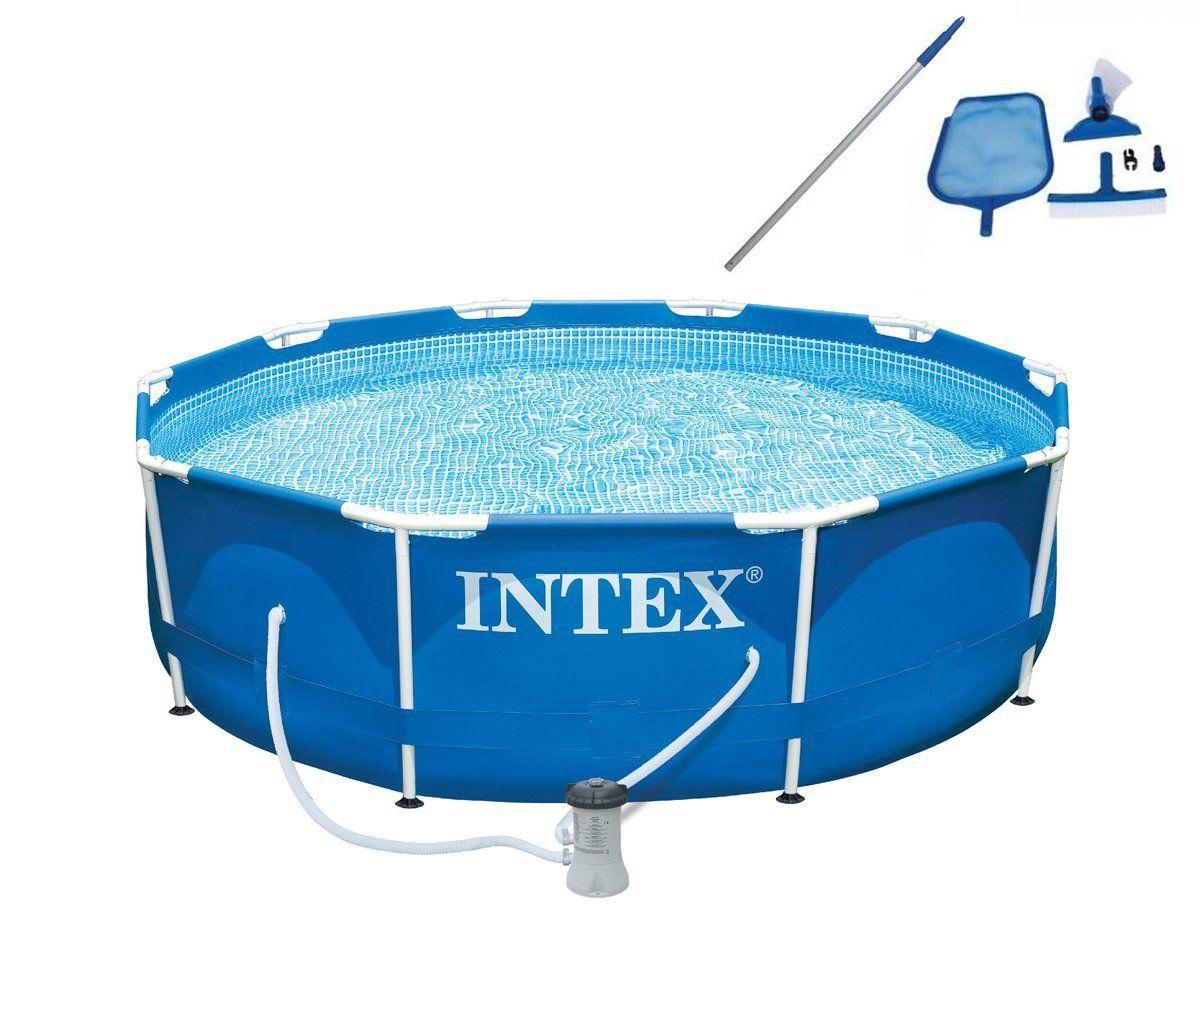 Intex 10 X 30 Metal Frame Set Swimming Pool With Filter Pump